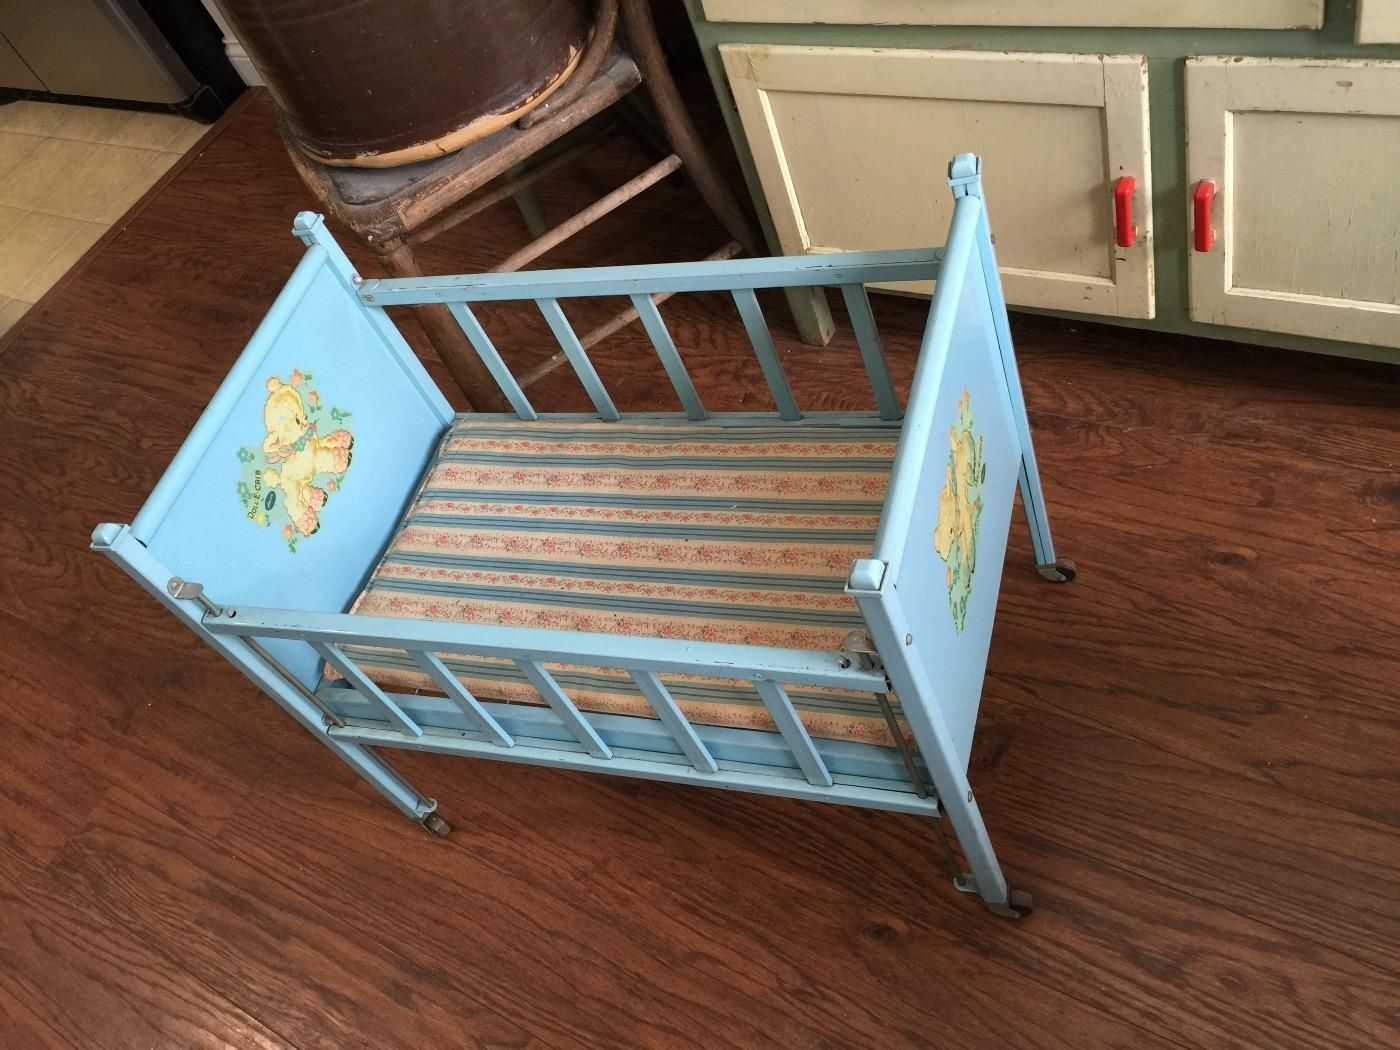 Baby doll crib mattress - For Sale Vintage 1950 Era Amsco Doll E Crib Toy This Is